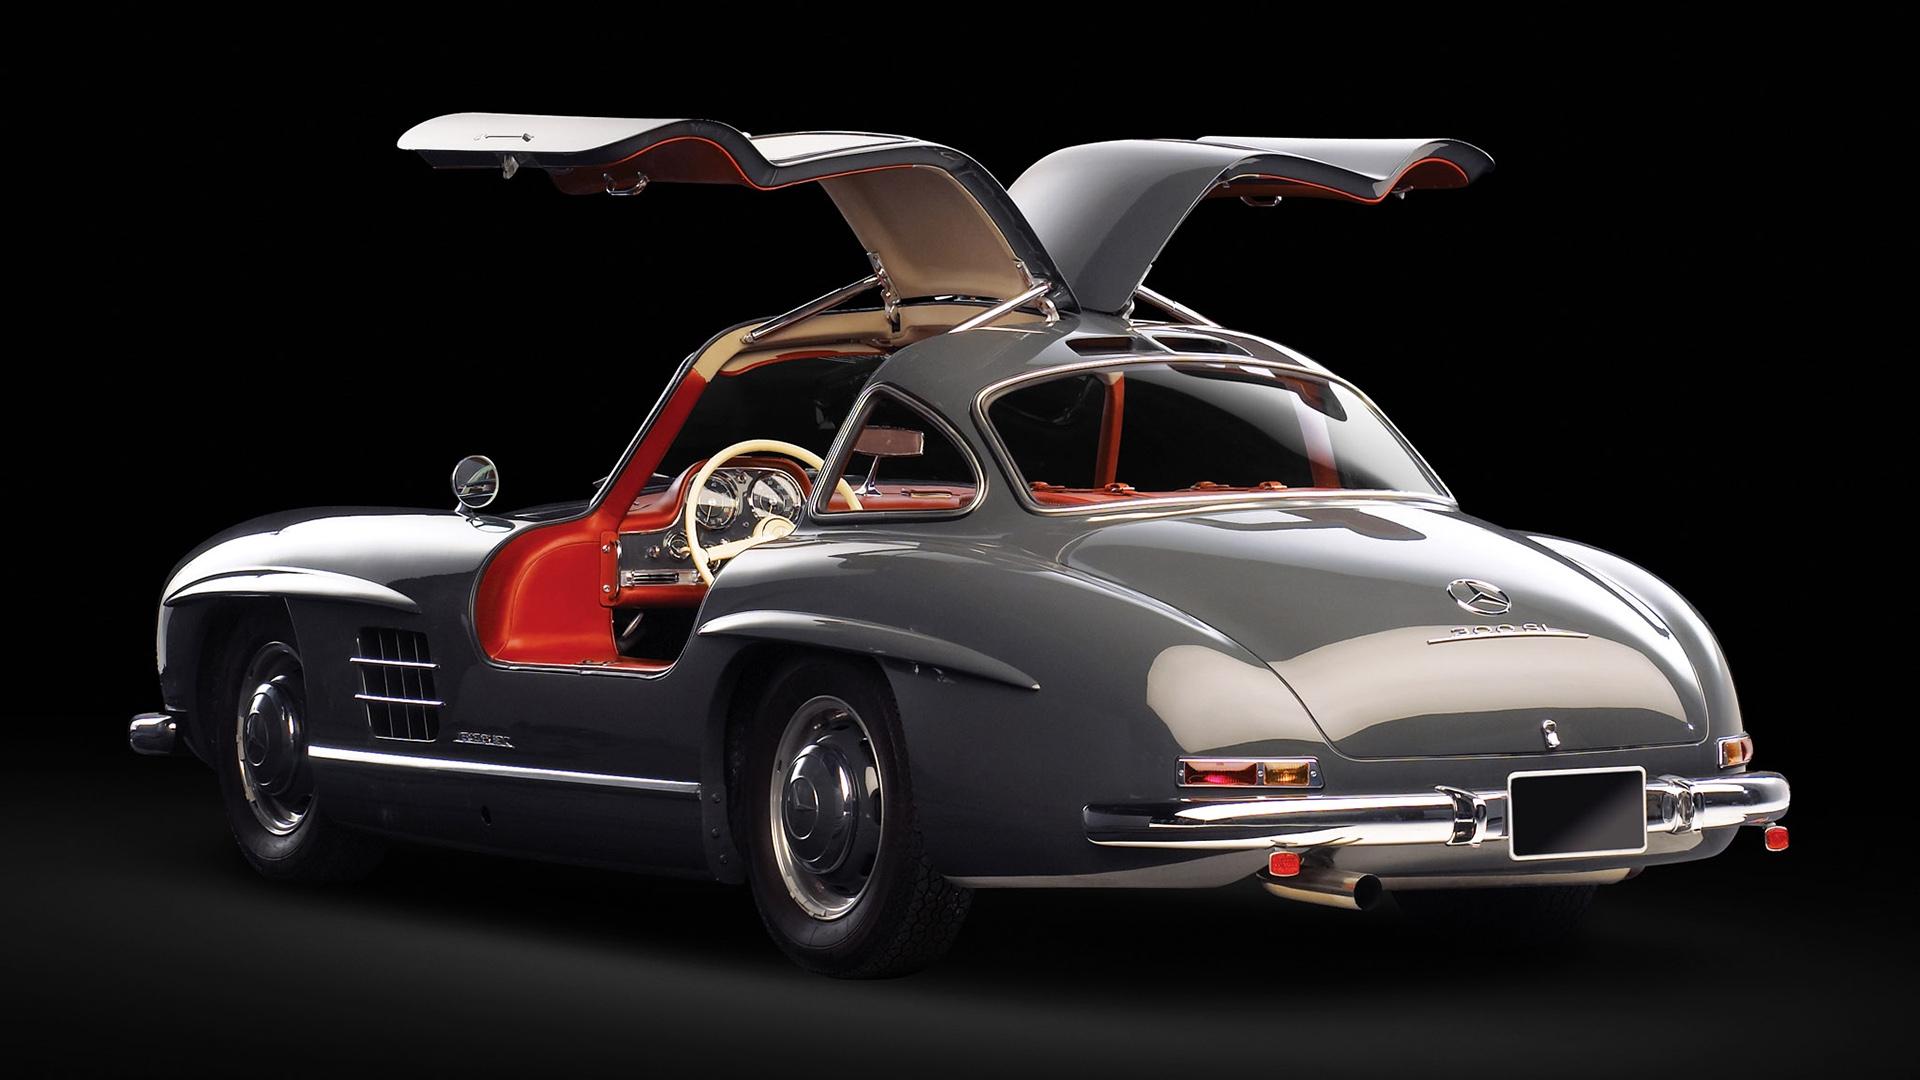 3dtuning of mercedes 300sl convertible 1954 unique on line car configurator for. Black Bedroom Furniture Sets. Home Design Ideas